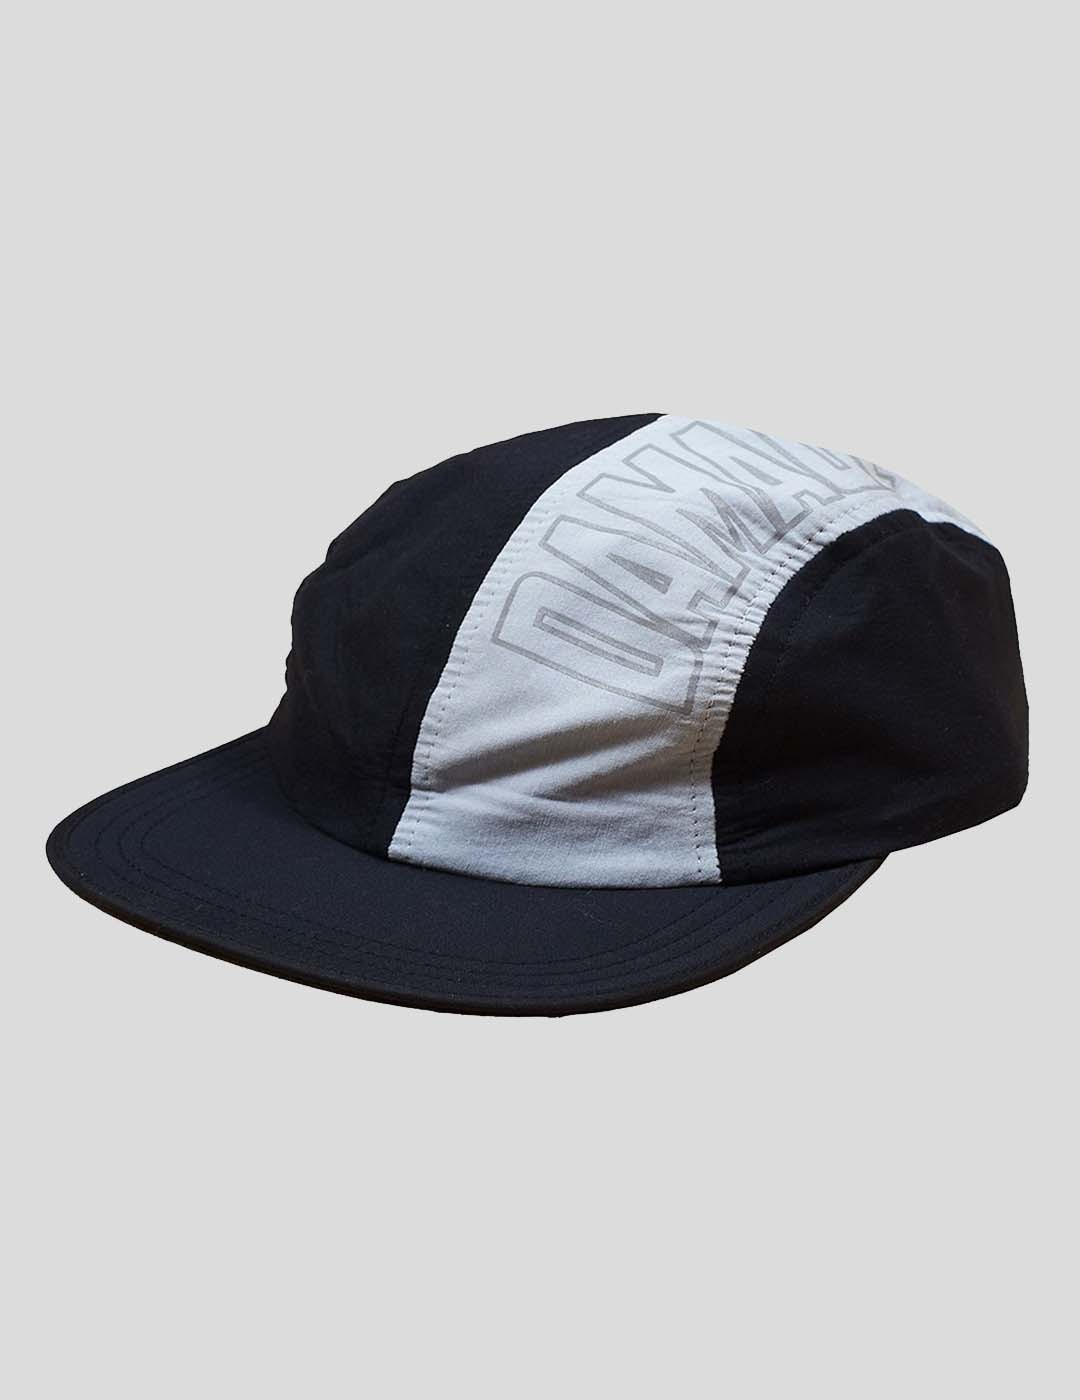 GORRA DAMAGE 4 PANEL TECH CAP BLACK/GREY